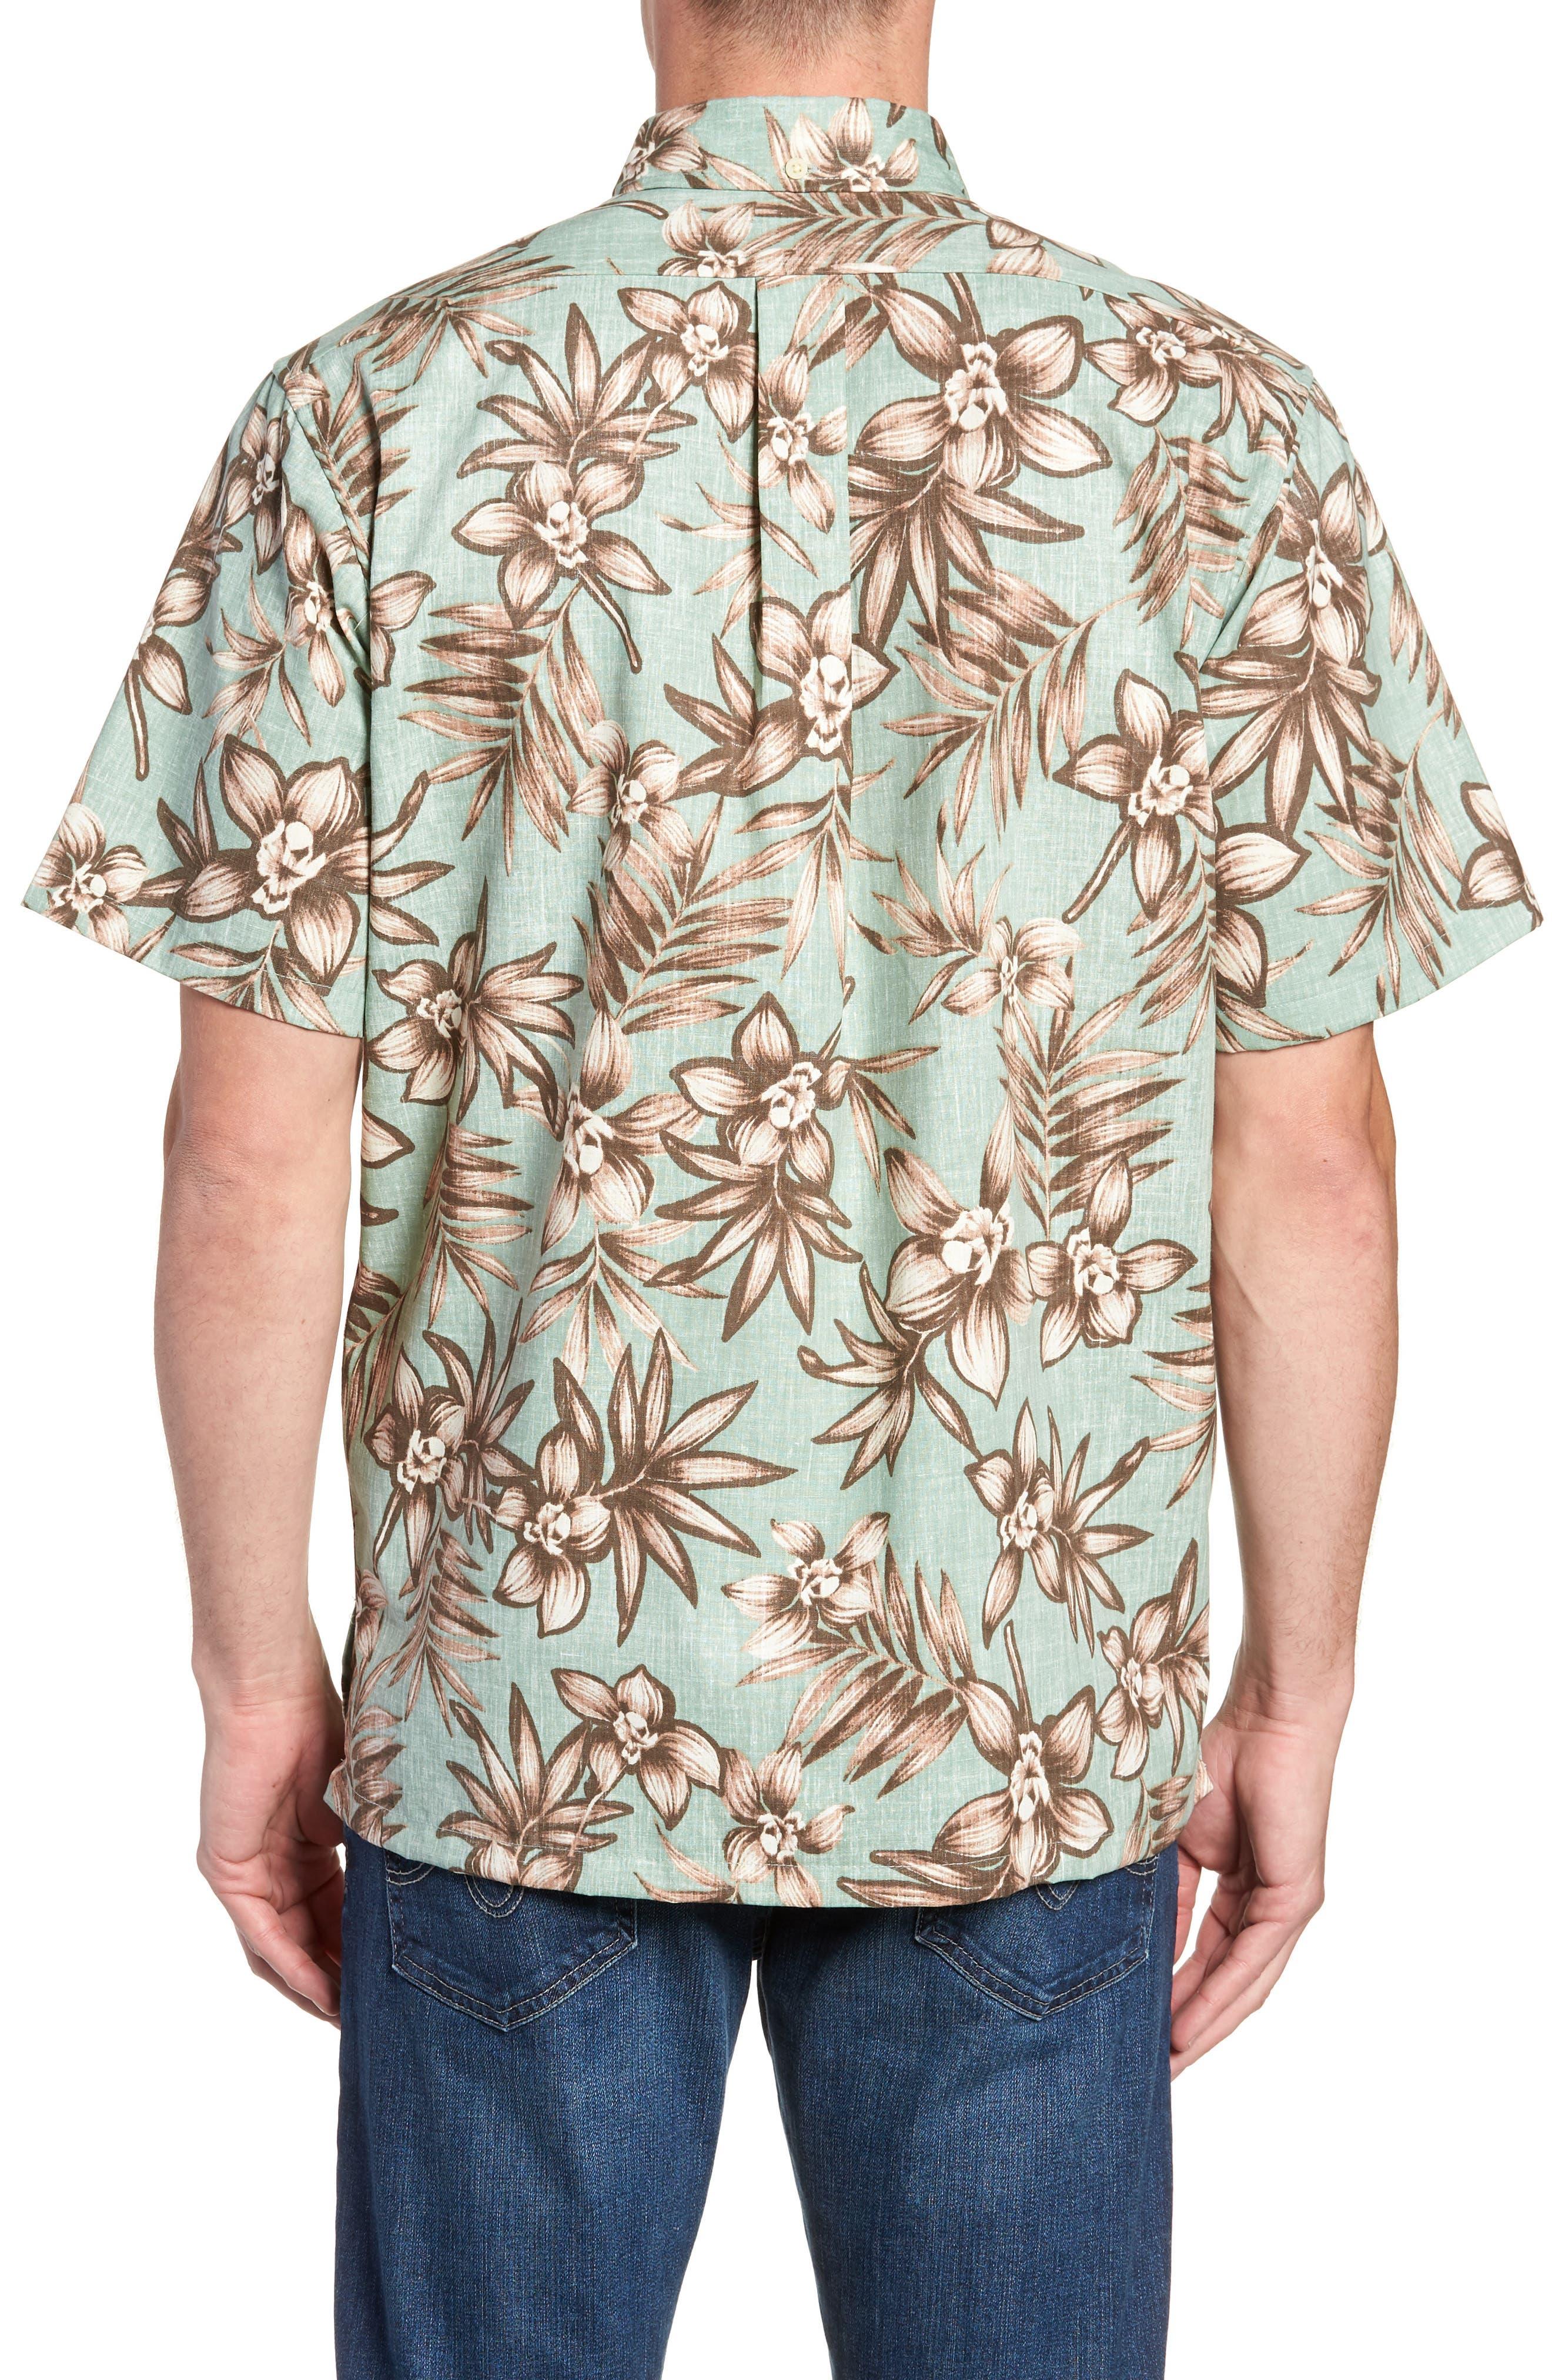 Onishi Garden Regular Fit Sport Shirt,                             Alternate thumbnail 3, color,                             Seafoam